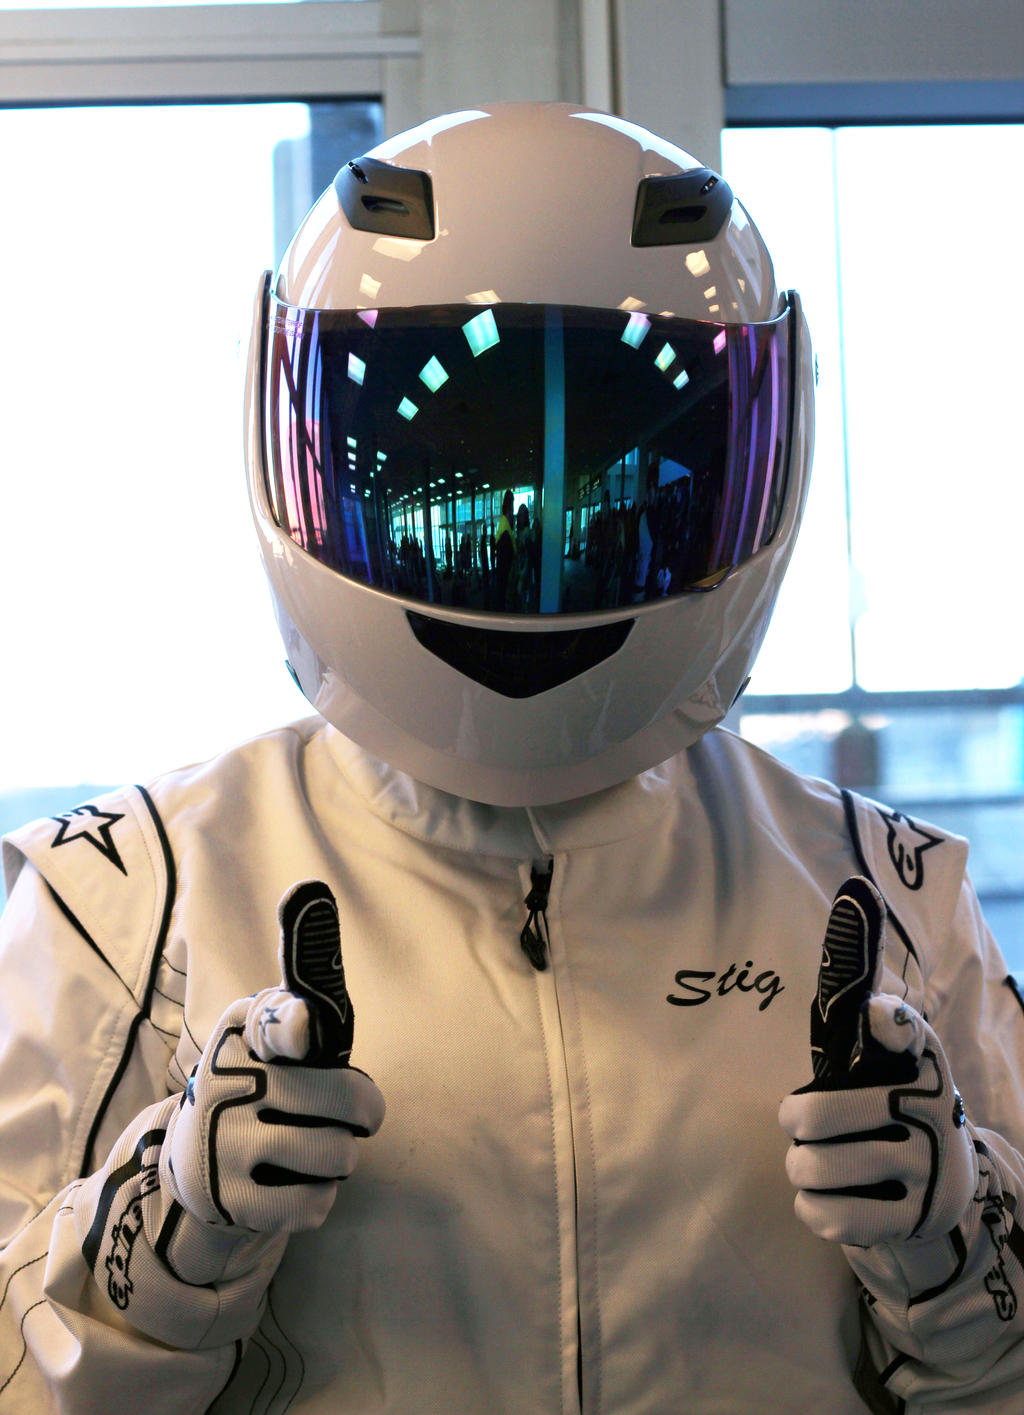 The Stig by geekypandaphotobox